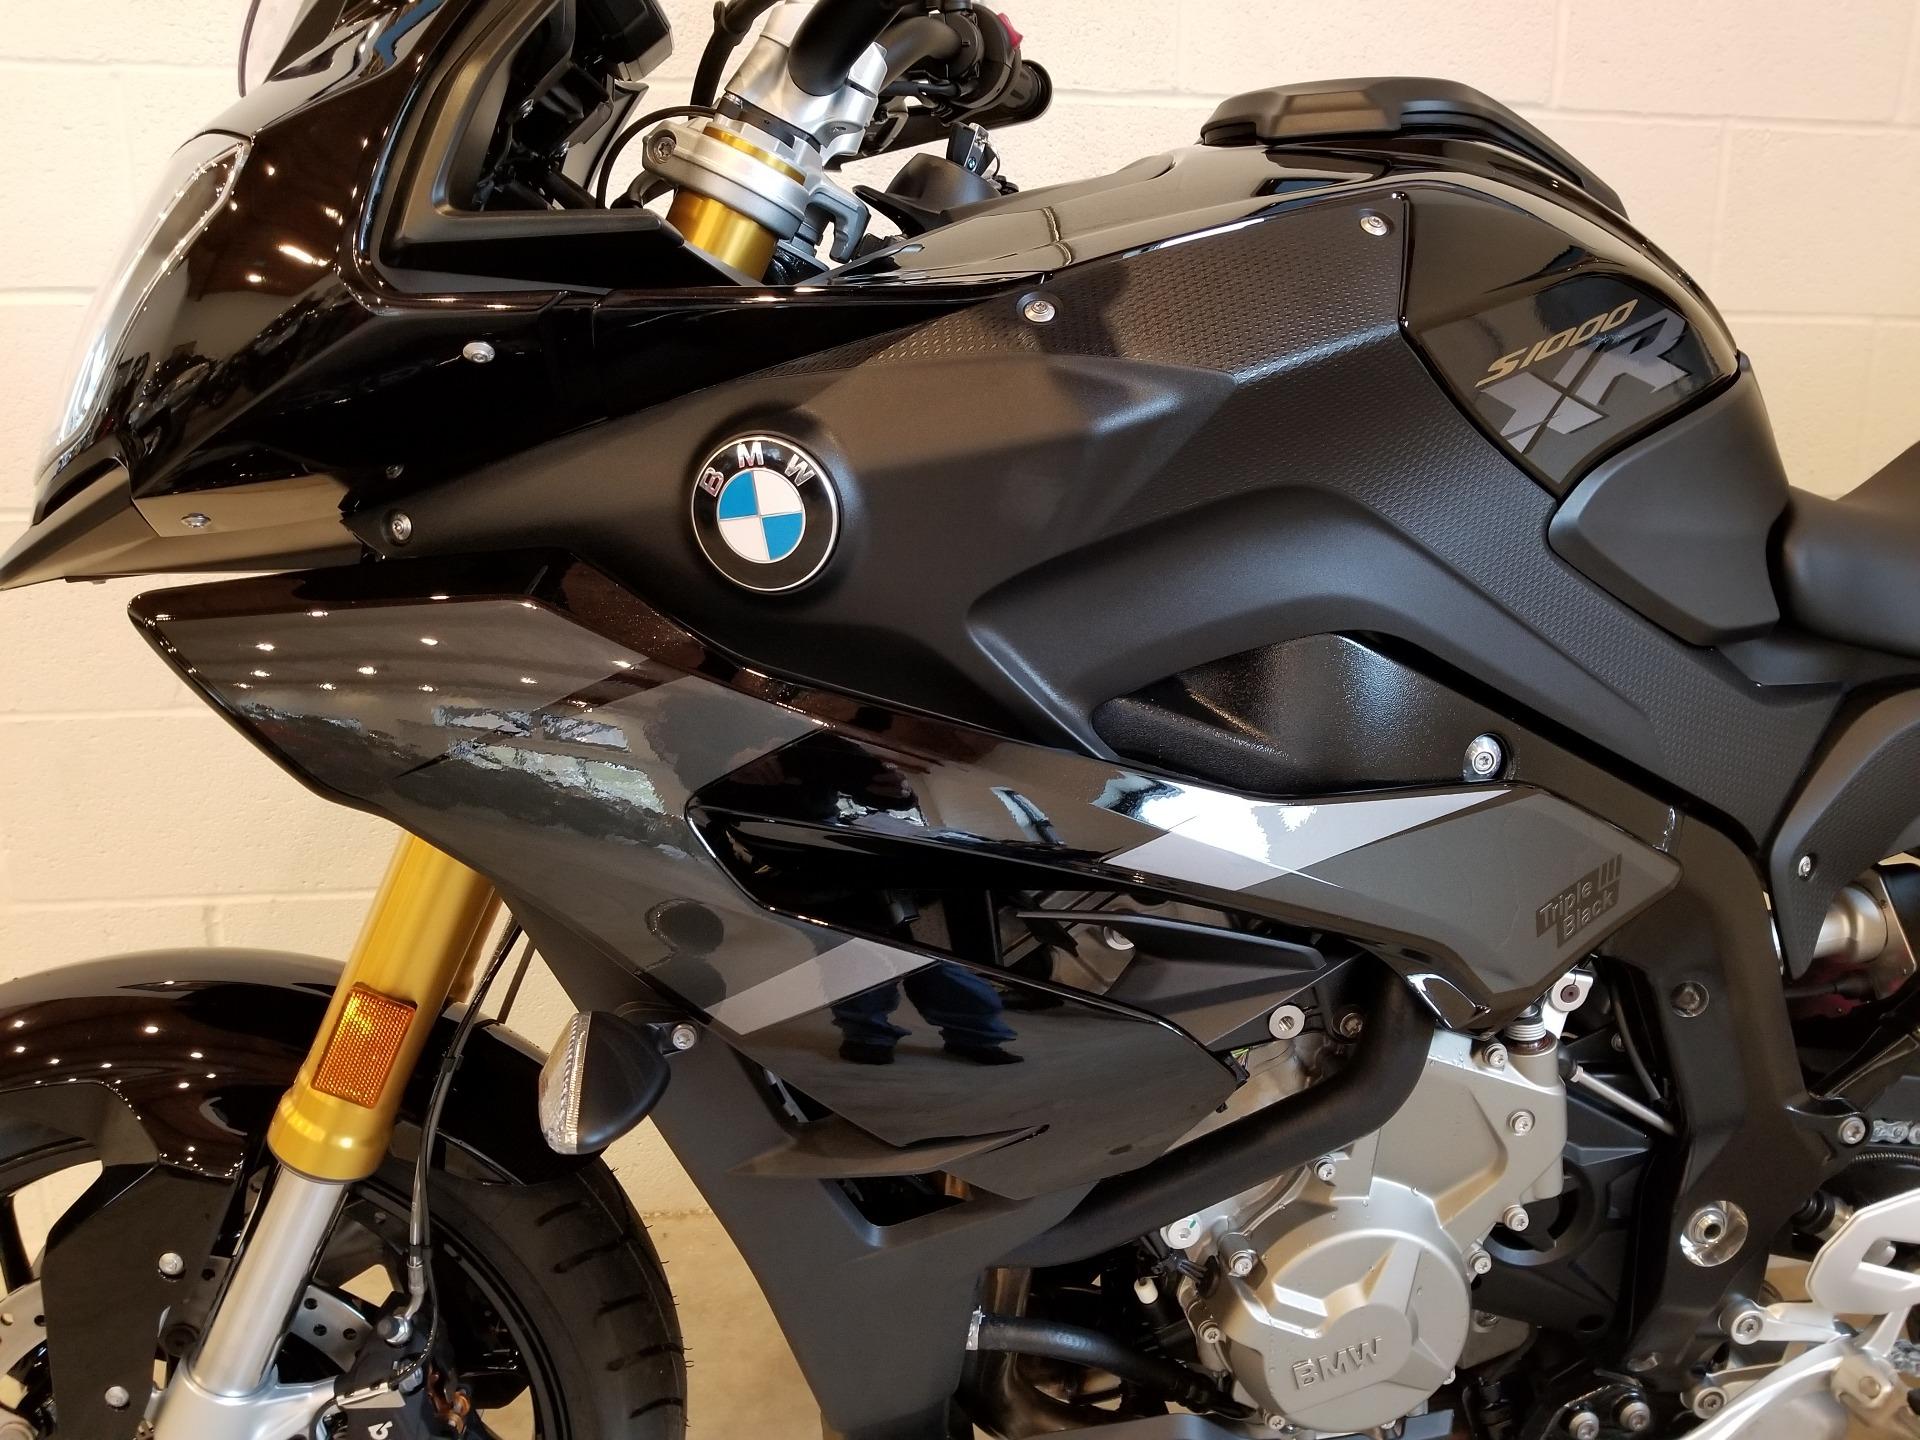 2019 bmw s 1000 xr motorcycles port clinton pennsylvania. Black Bedroom Furniture Sets. Home Design Ideas